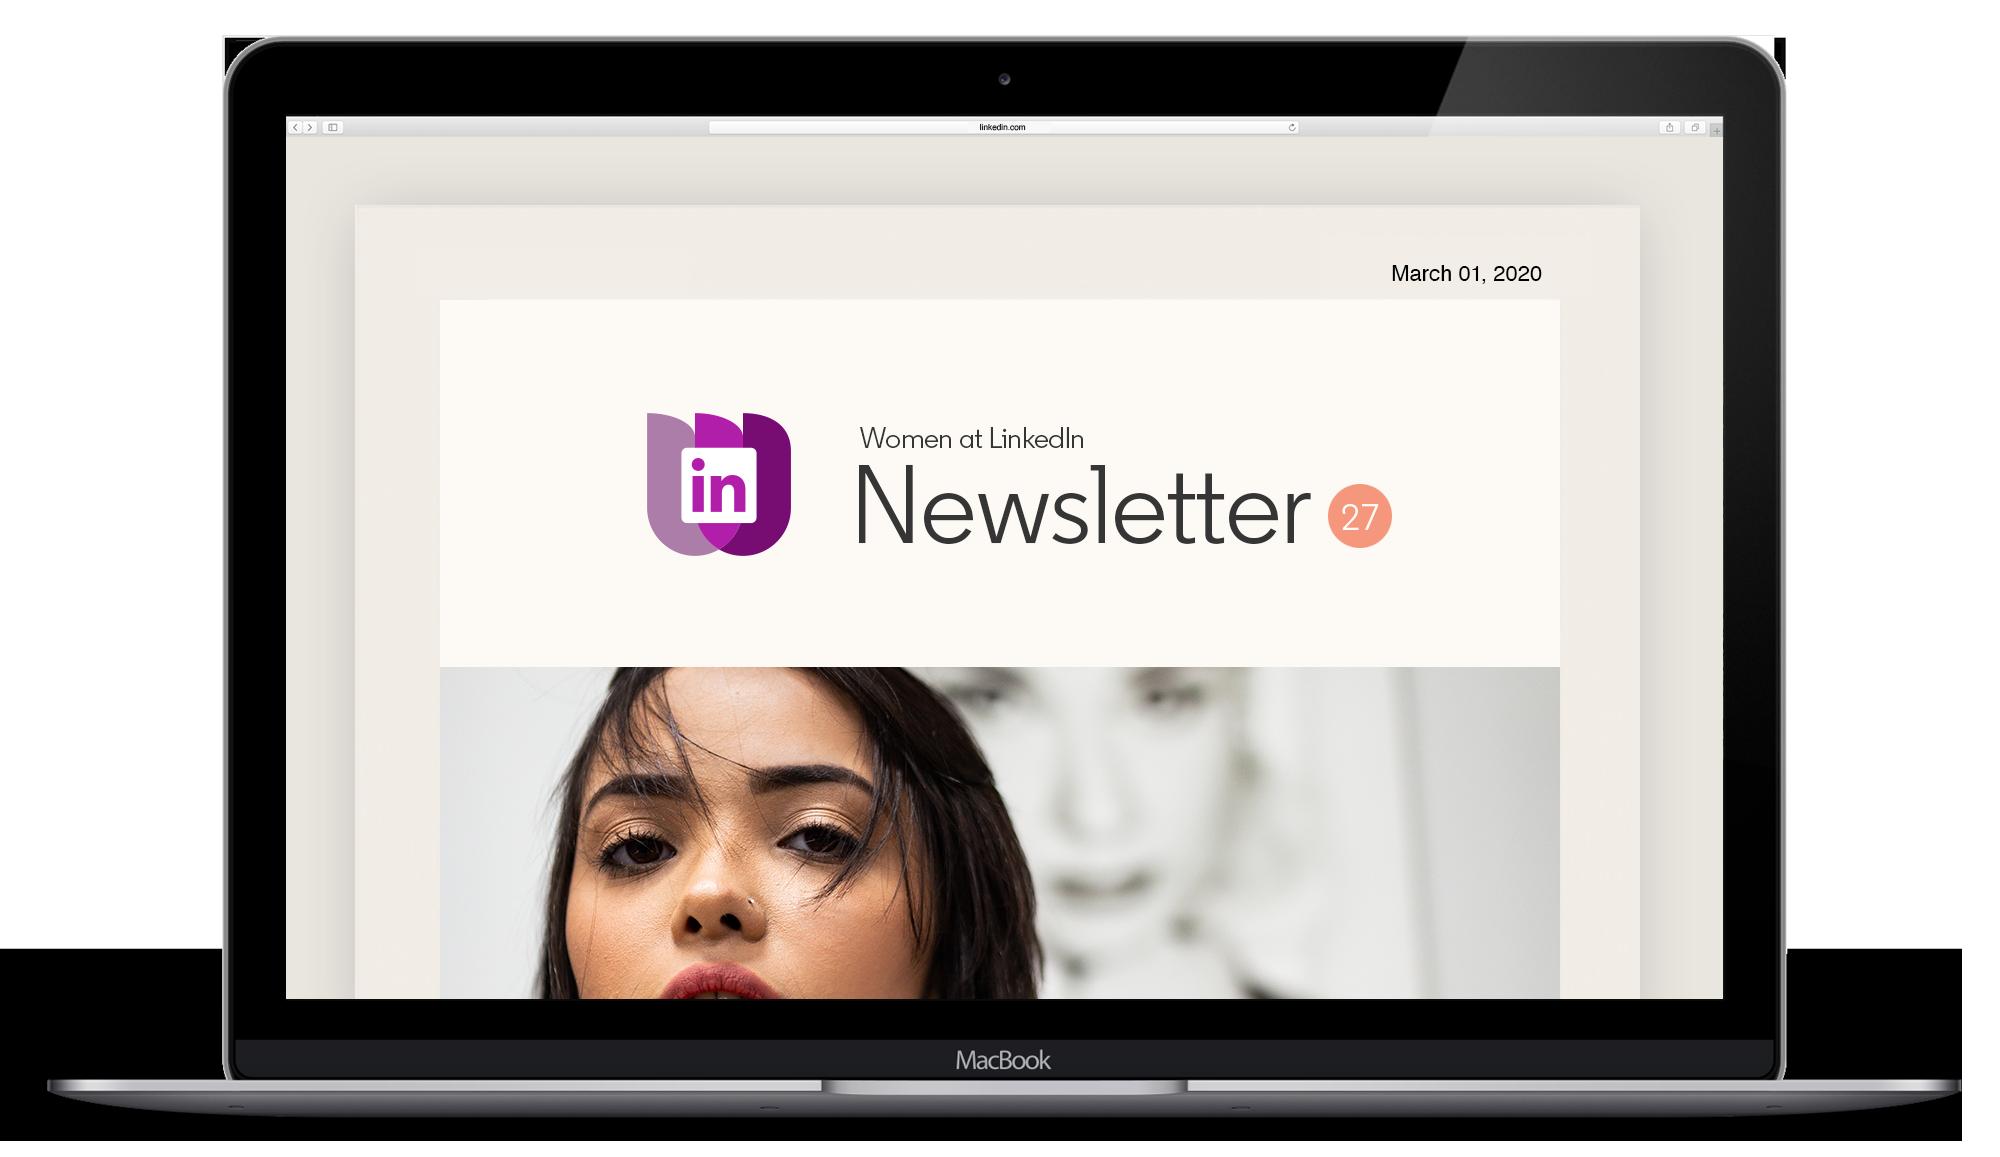 LinkedIn Employee Resource Group women's newsletter on computer